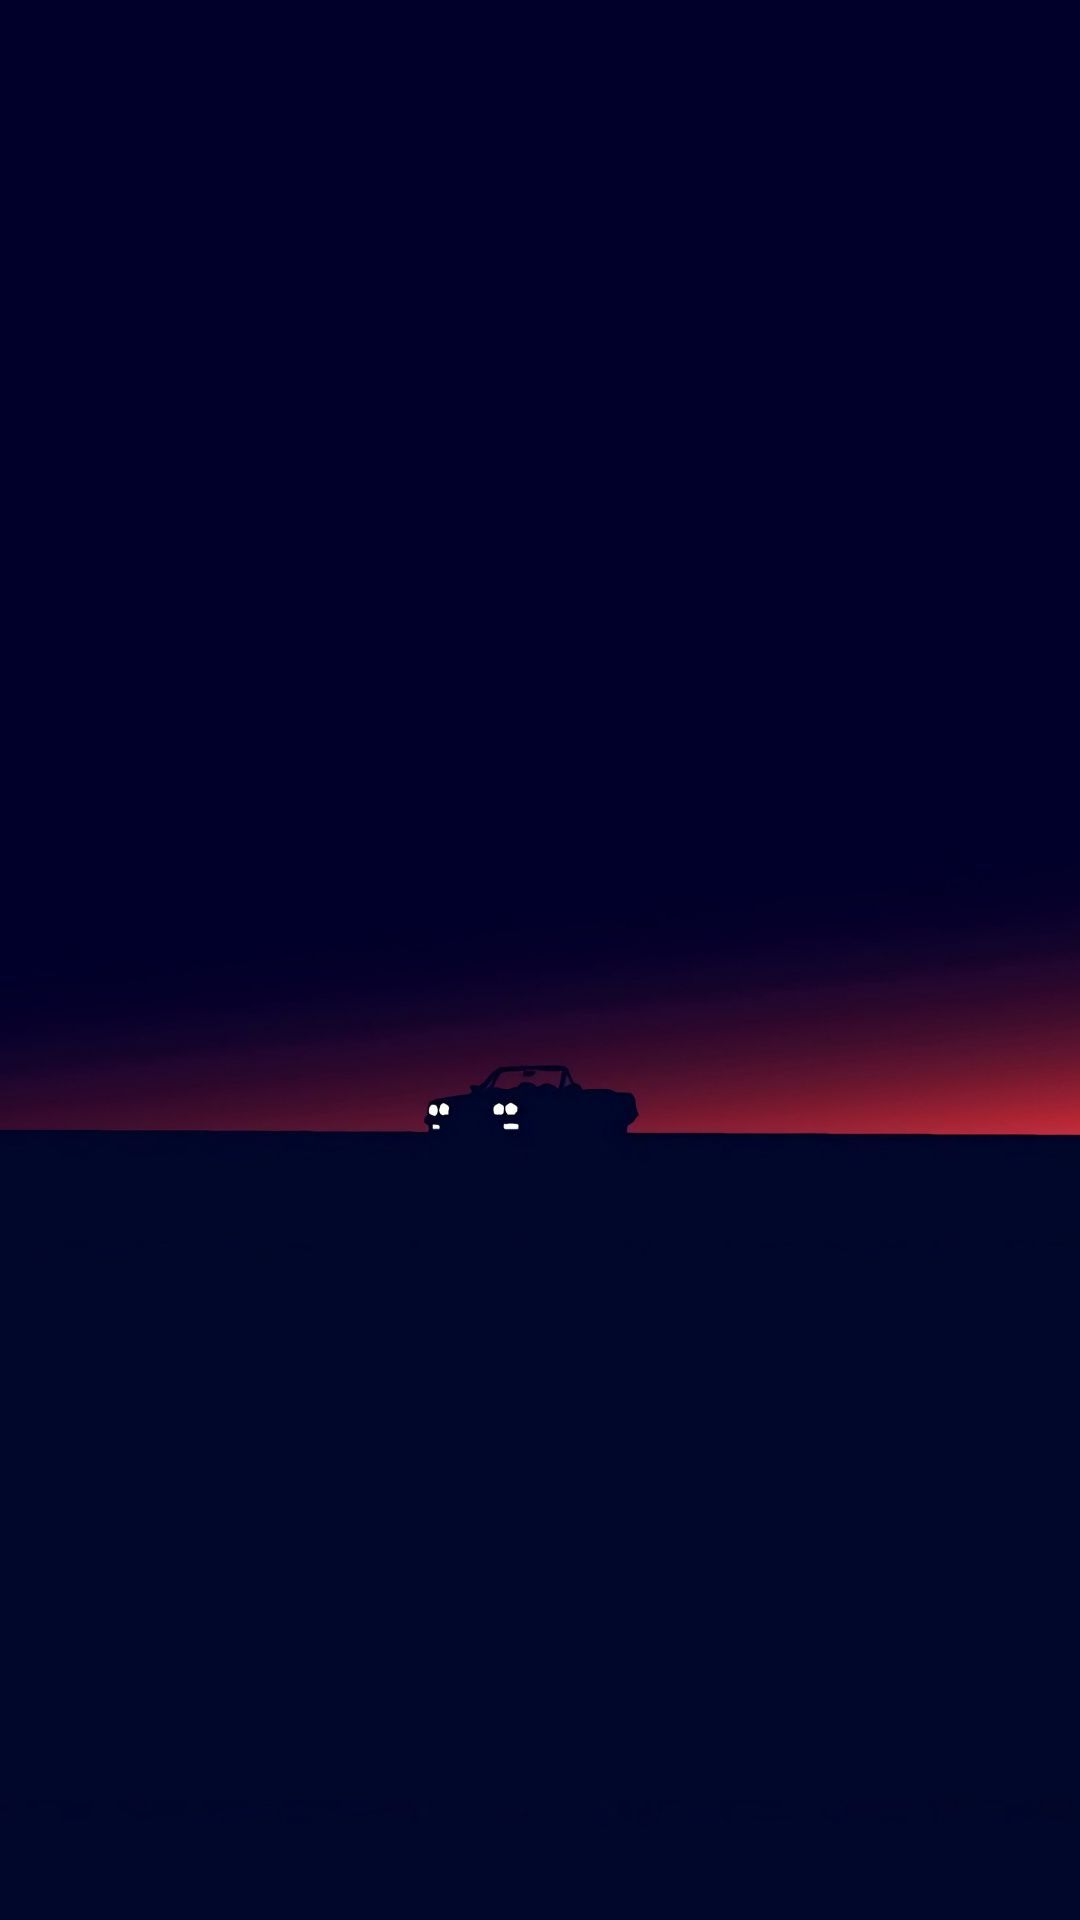 Car Silhouette Dark Twilight Minimal 1080x19 Wallpaper 壁紙の背景 ロック画面用 壁紙 携帯電話の壁紙 機能 壁紙 クールな壁紙 壁紙 Minimalist Wallpaper Minimal Wallpaper Dark Wallpaper